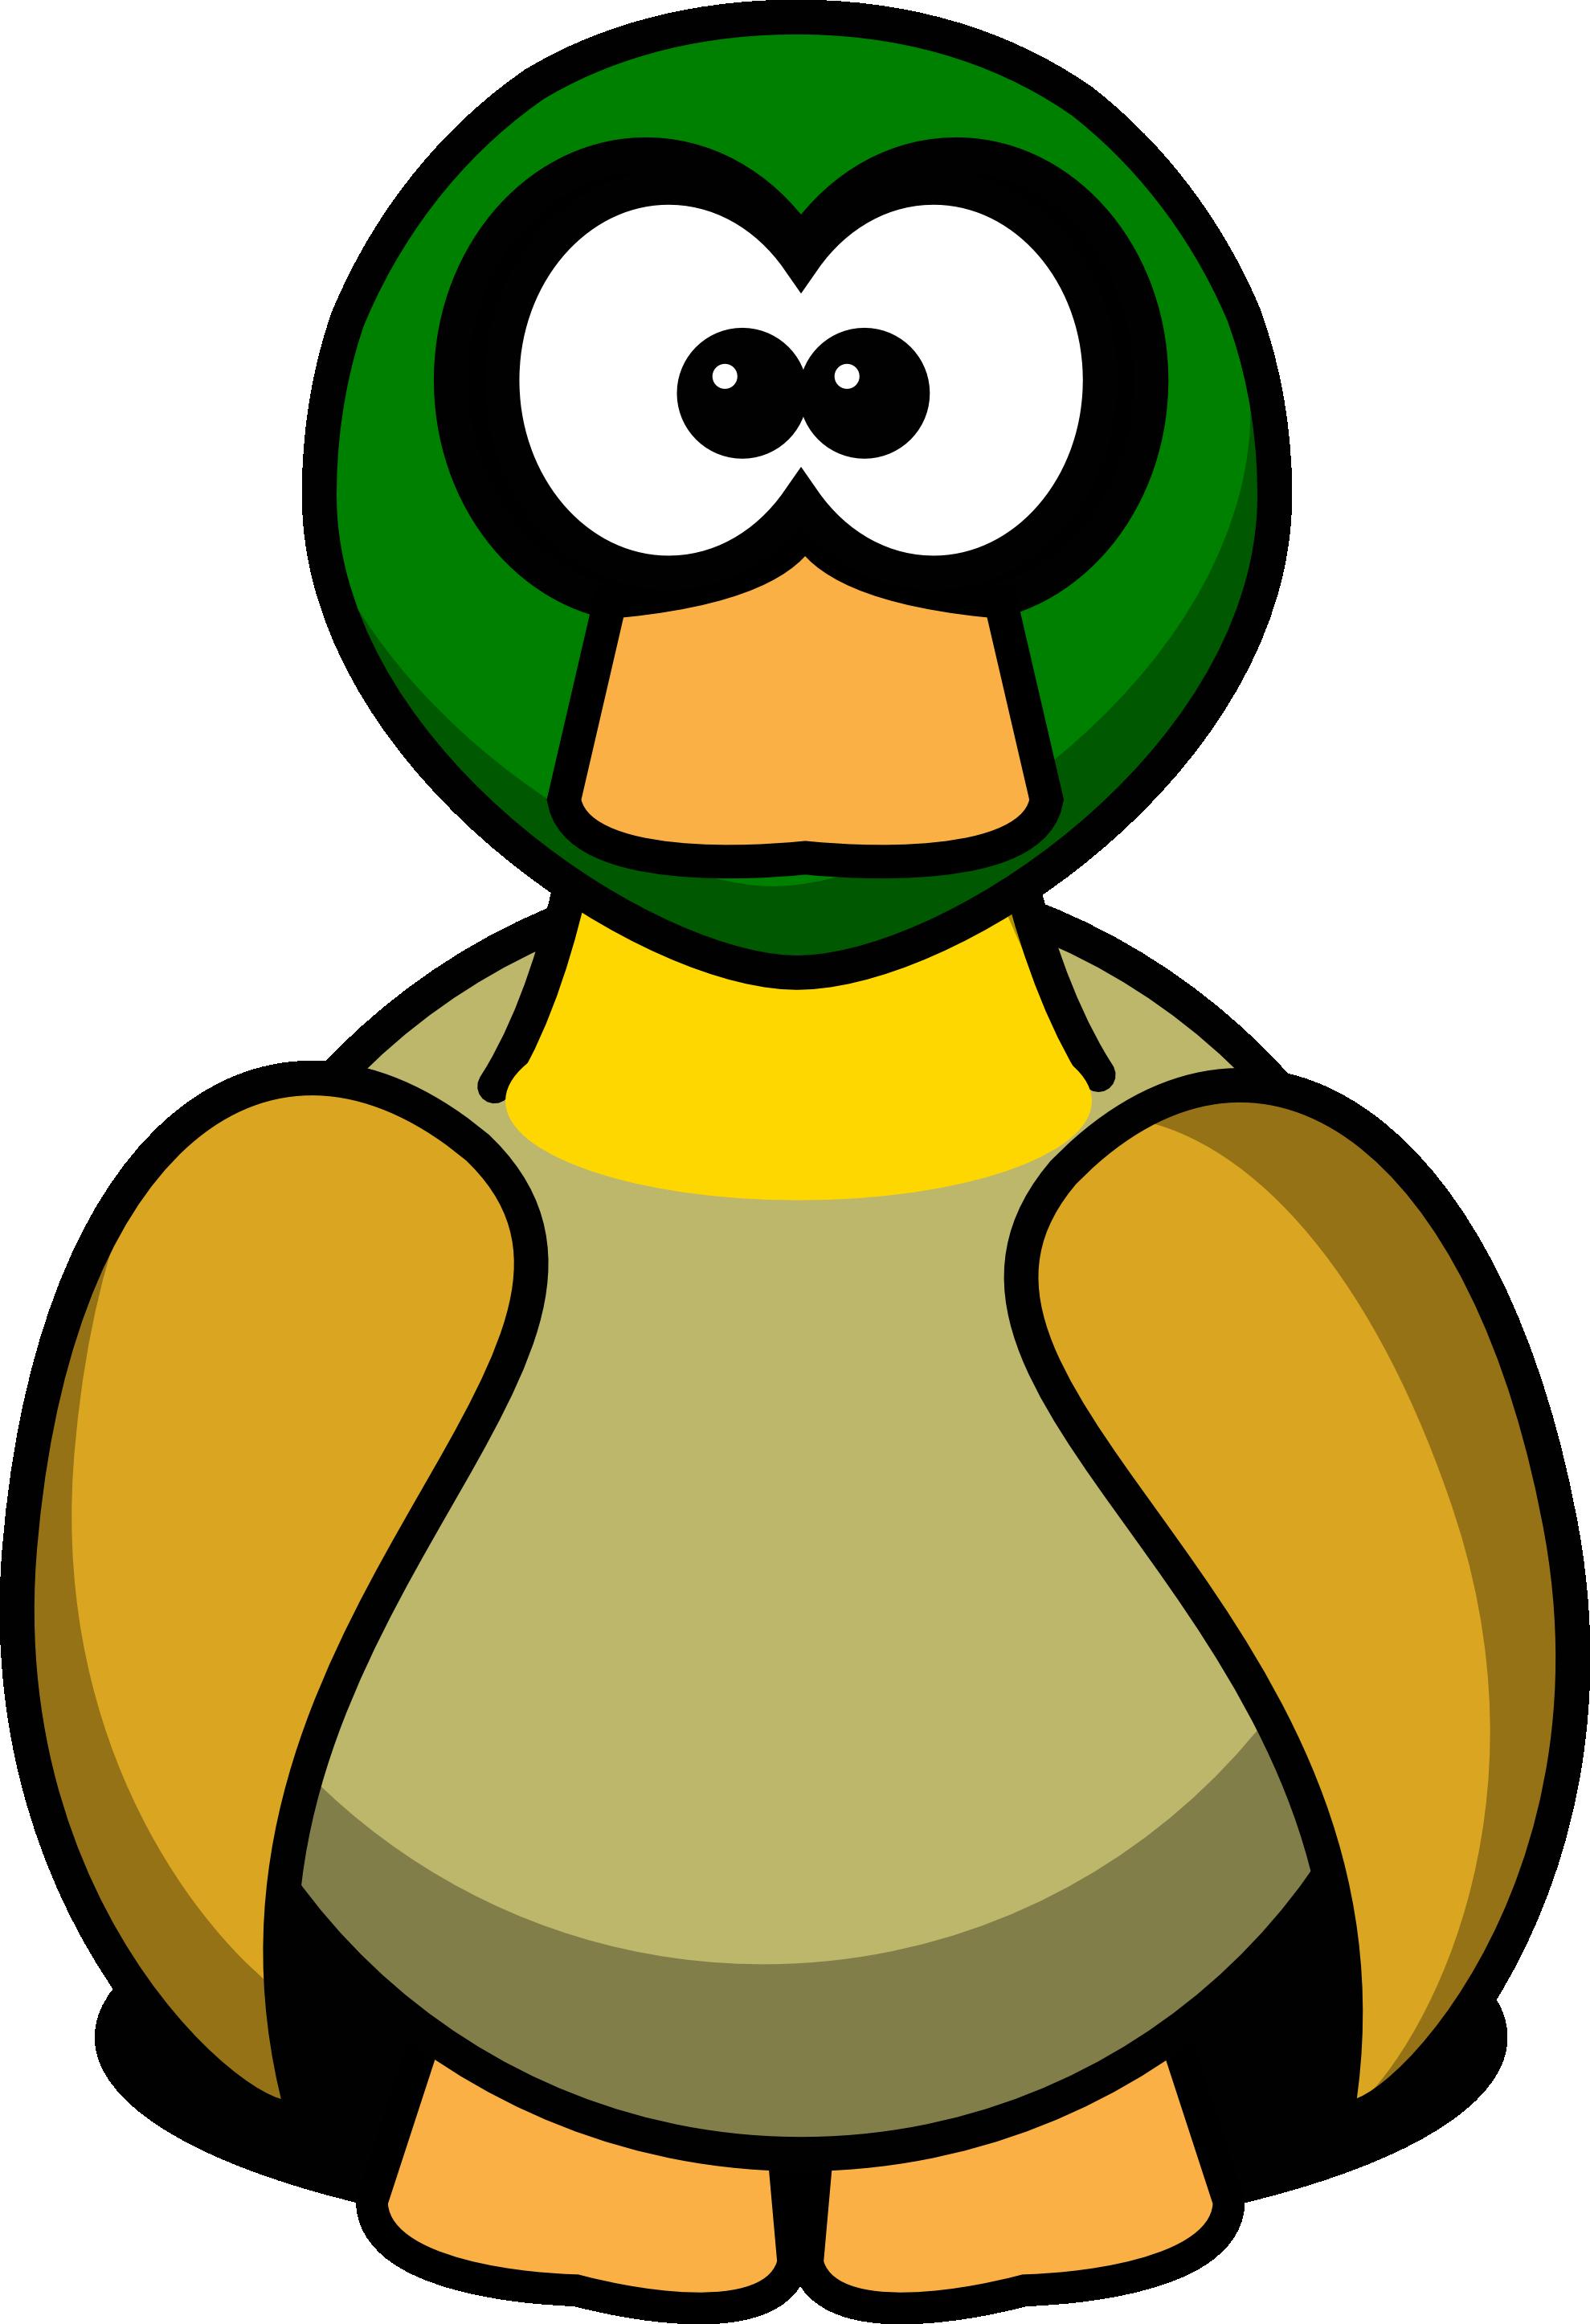 Clipart duck vector. See desktop backgrounds cute